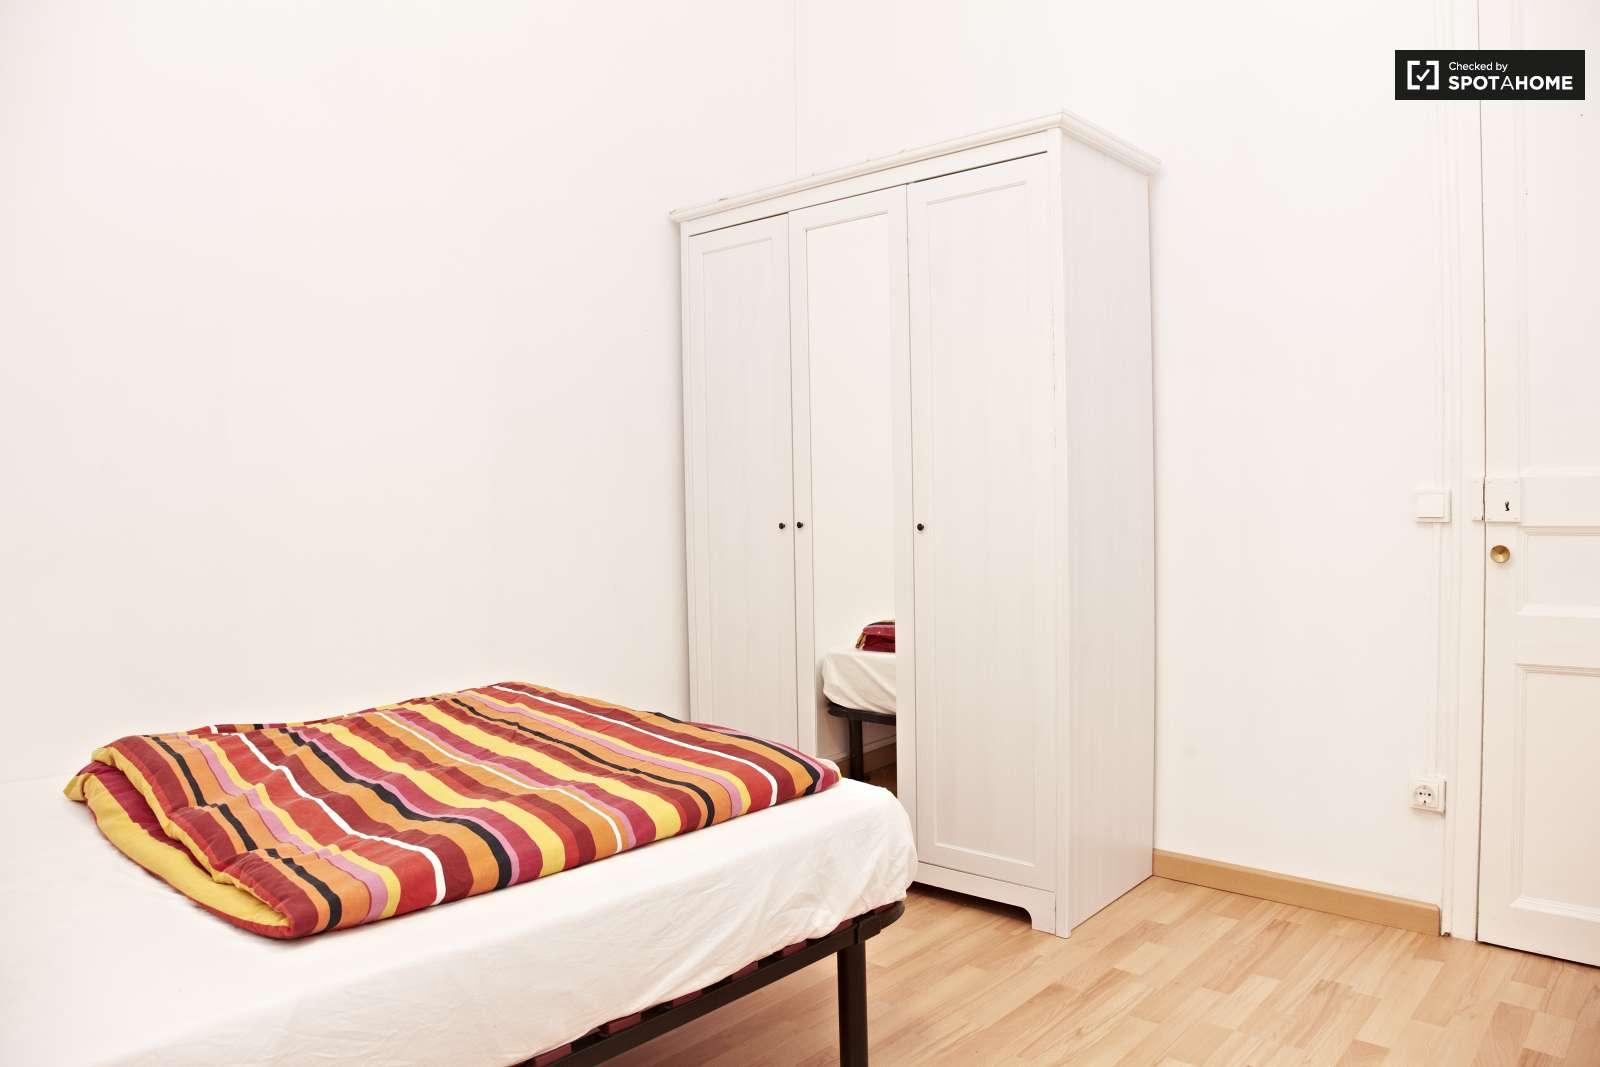 Tranquila habitaci n en piso en vila de gr cia barcelona for Habitacion 73 barcelona